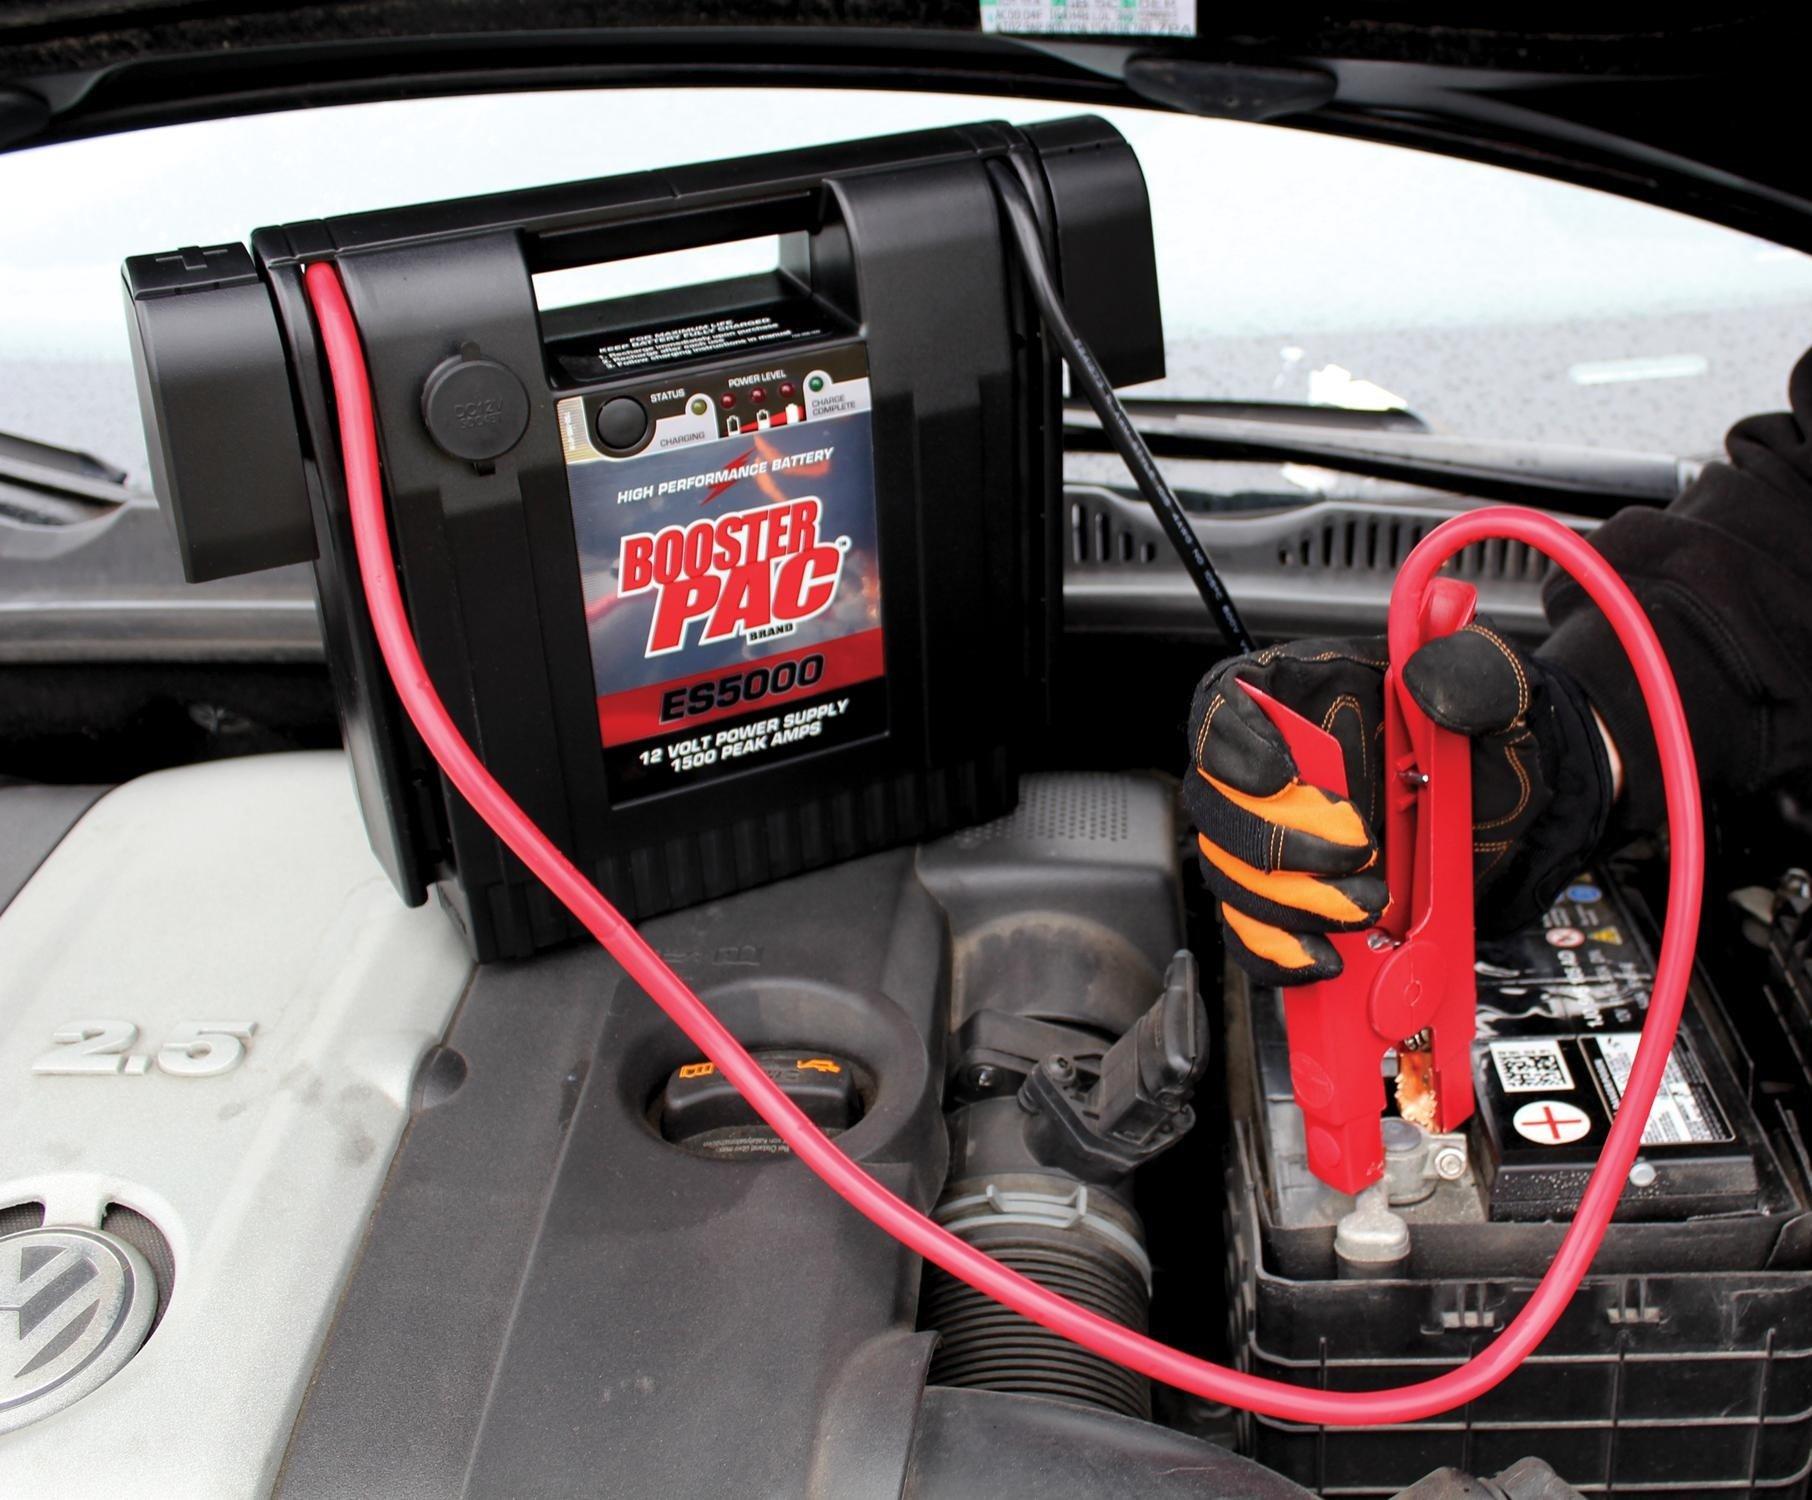 Booster PAC ES5000 1500 Peak Amp 12V Jump Starter by Clore Automotive (Image #2)